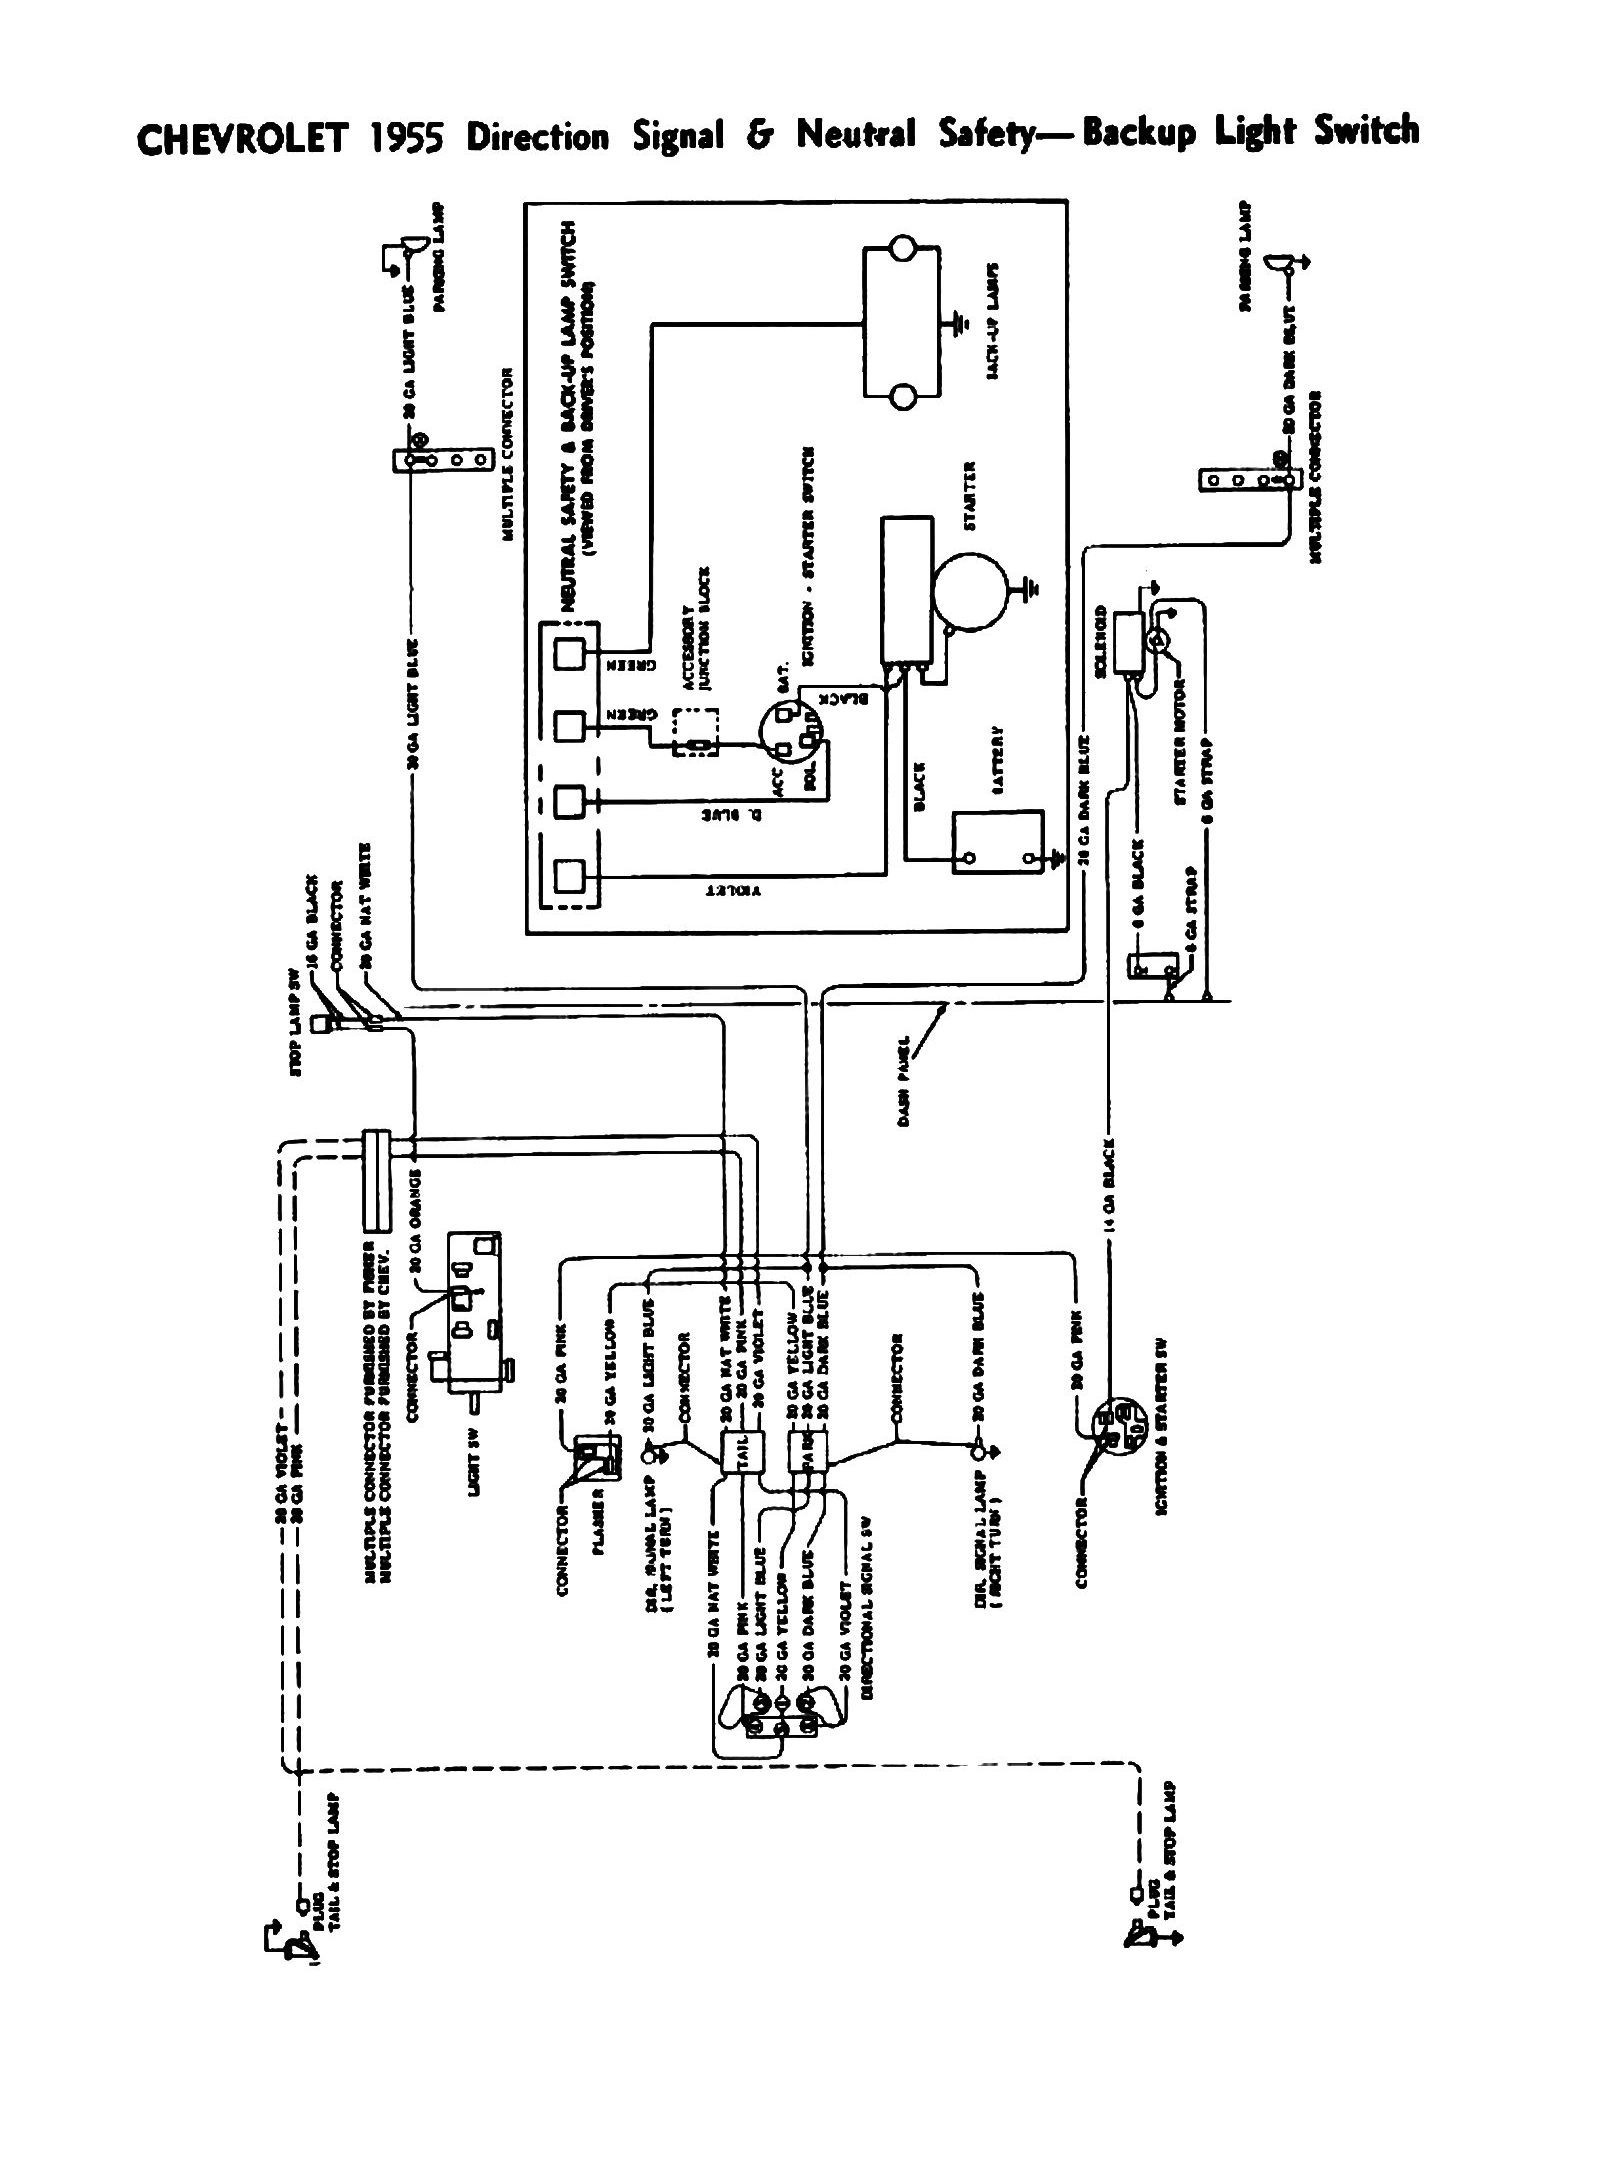 Headlight Switch Wiring Diagram Chevy Truck Turn Signal Wiring Diagram Chevy Truck Shahsramblings Of Headlight Switch Wiring Diagram Chevy Truck